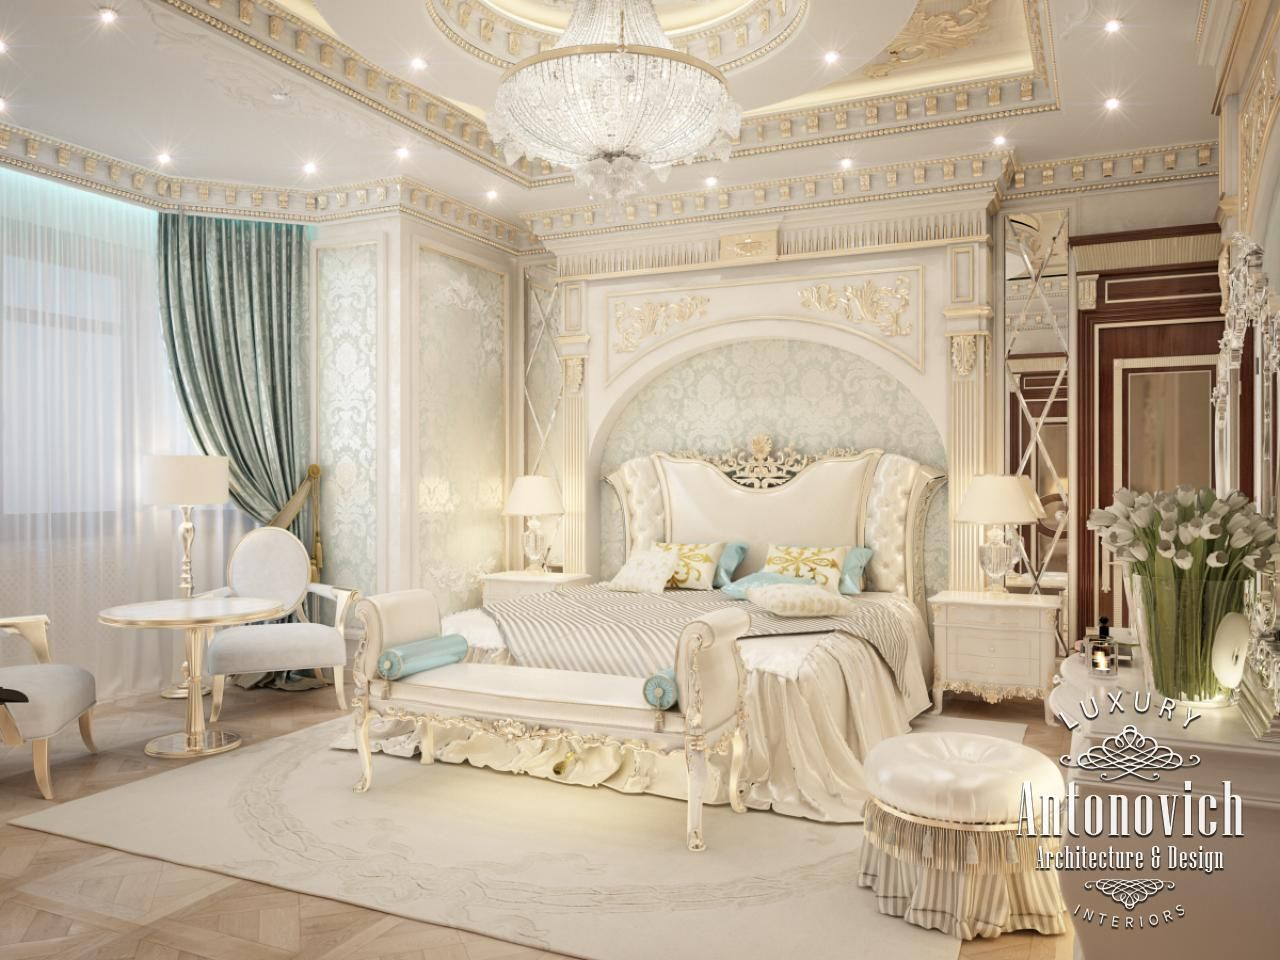 luxurious arabic style bedroom Bedroom Design in Dubai, Gorgeous Bedroom, Photo 1